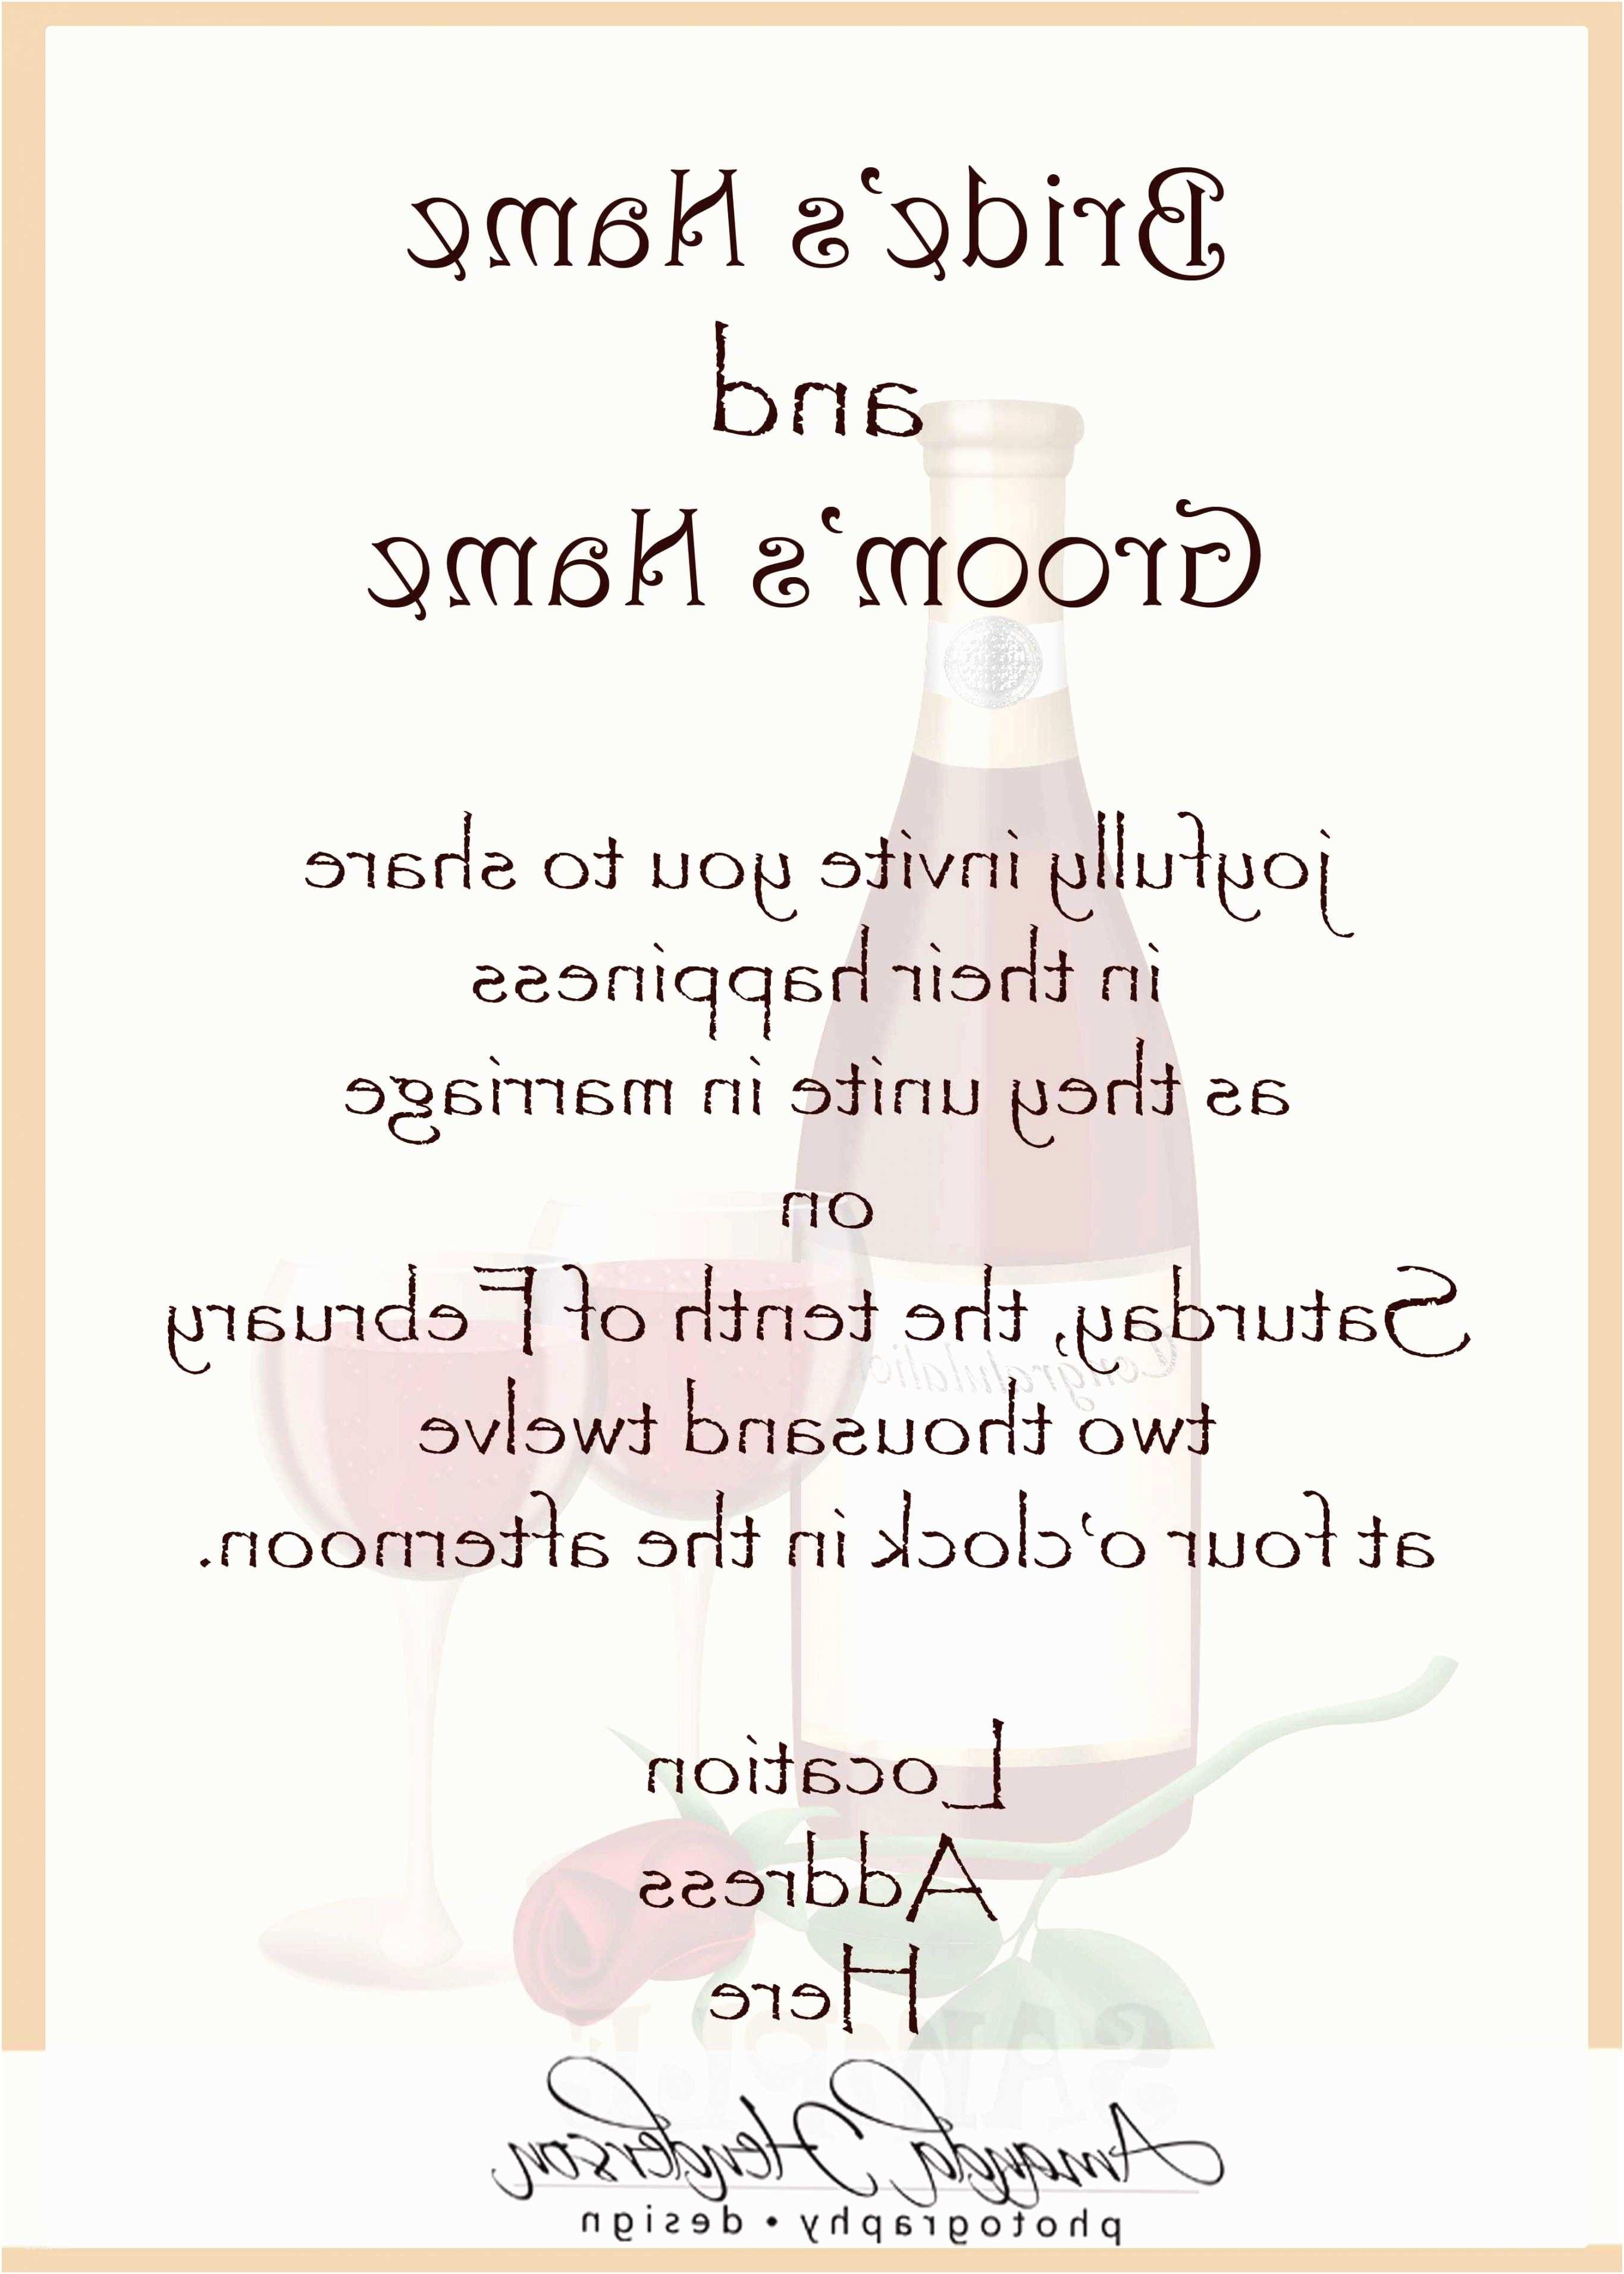 Bride and Groom Wedding Invitations Wedding Invitation Wording Examples Bride and Groom